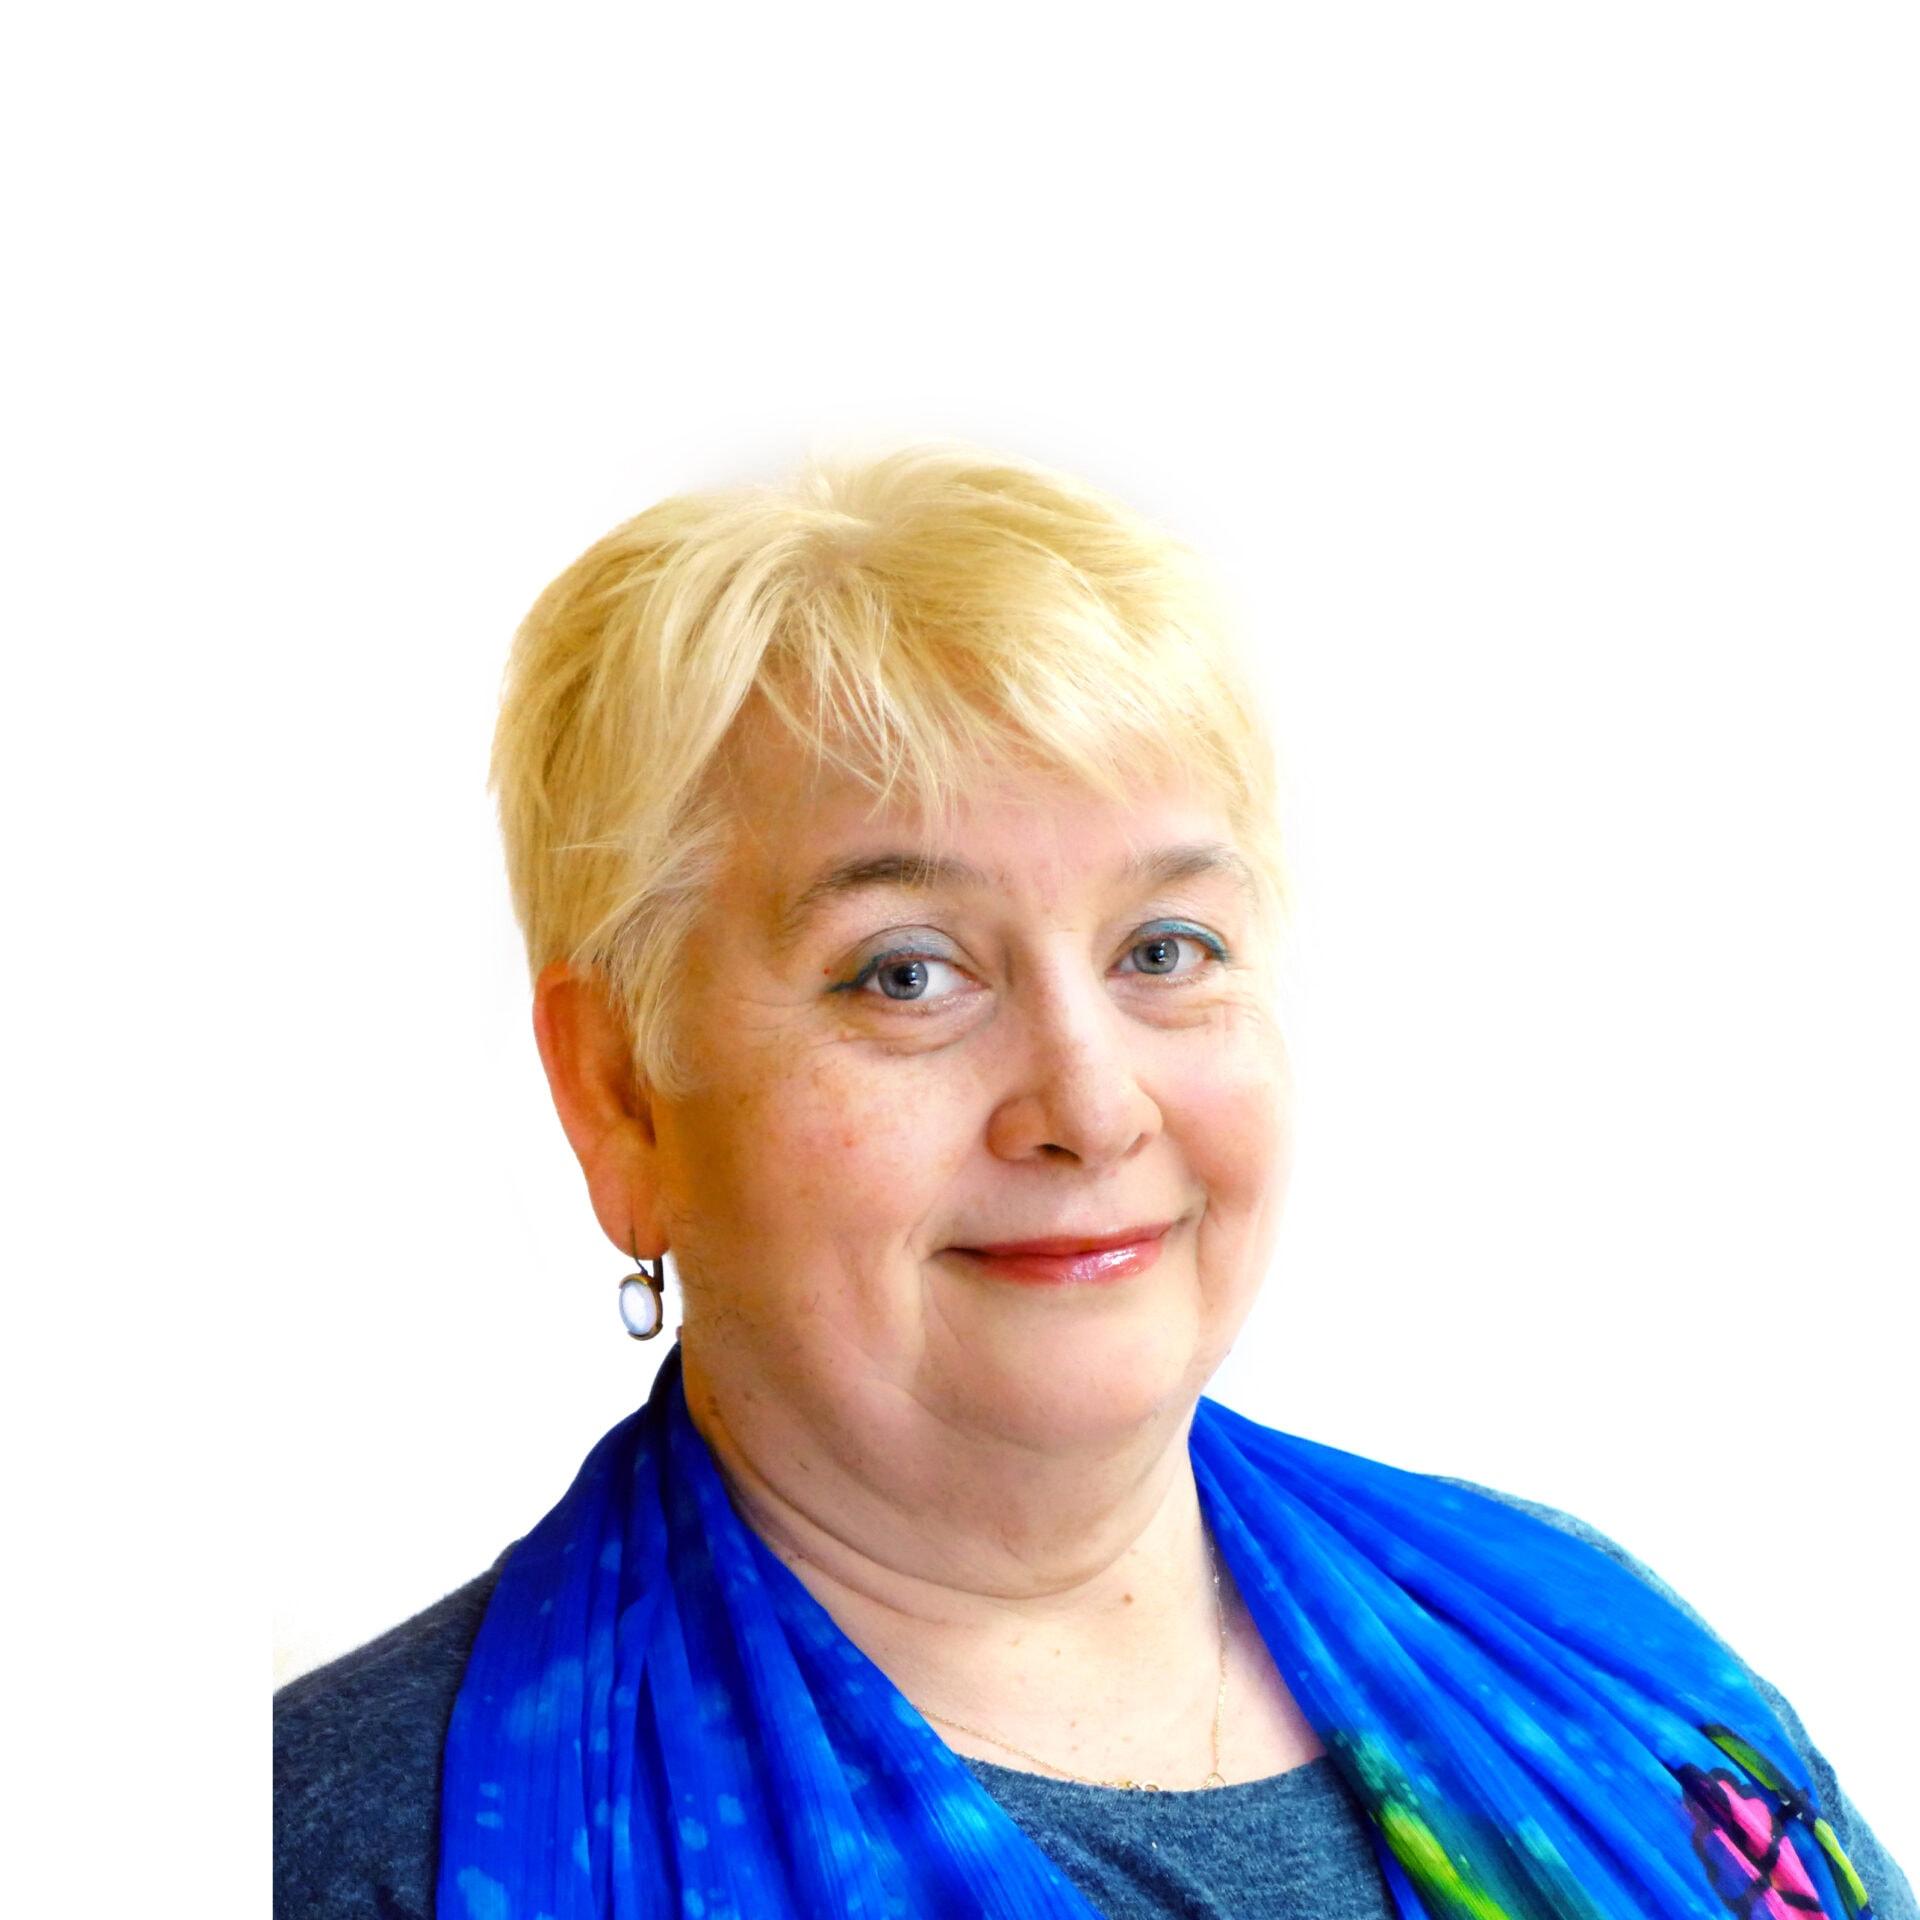 MUDr. Alexandra Havlicova